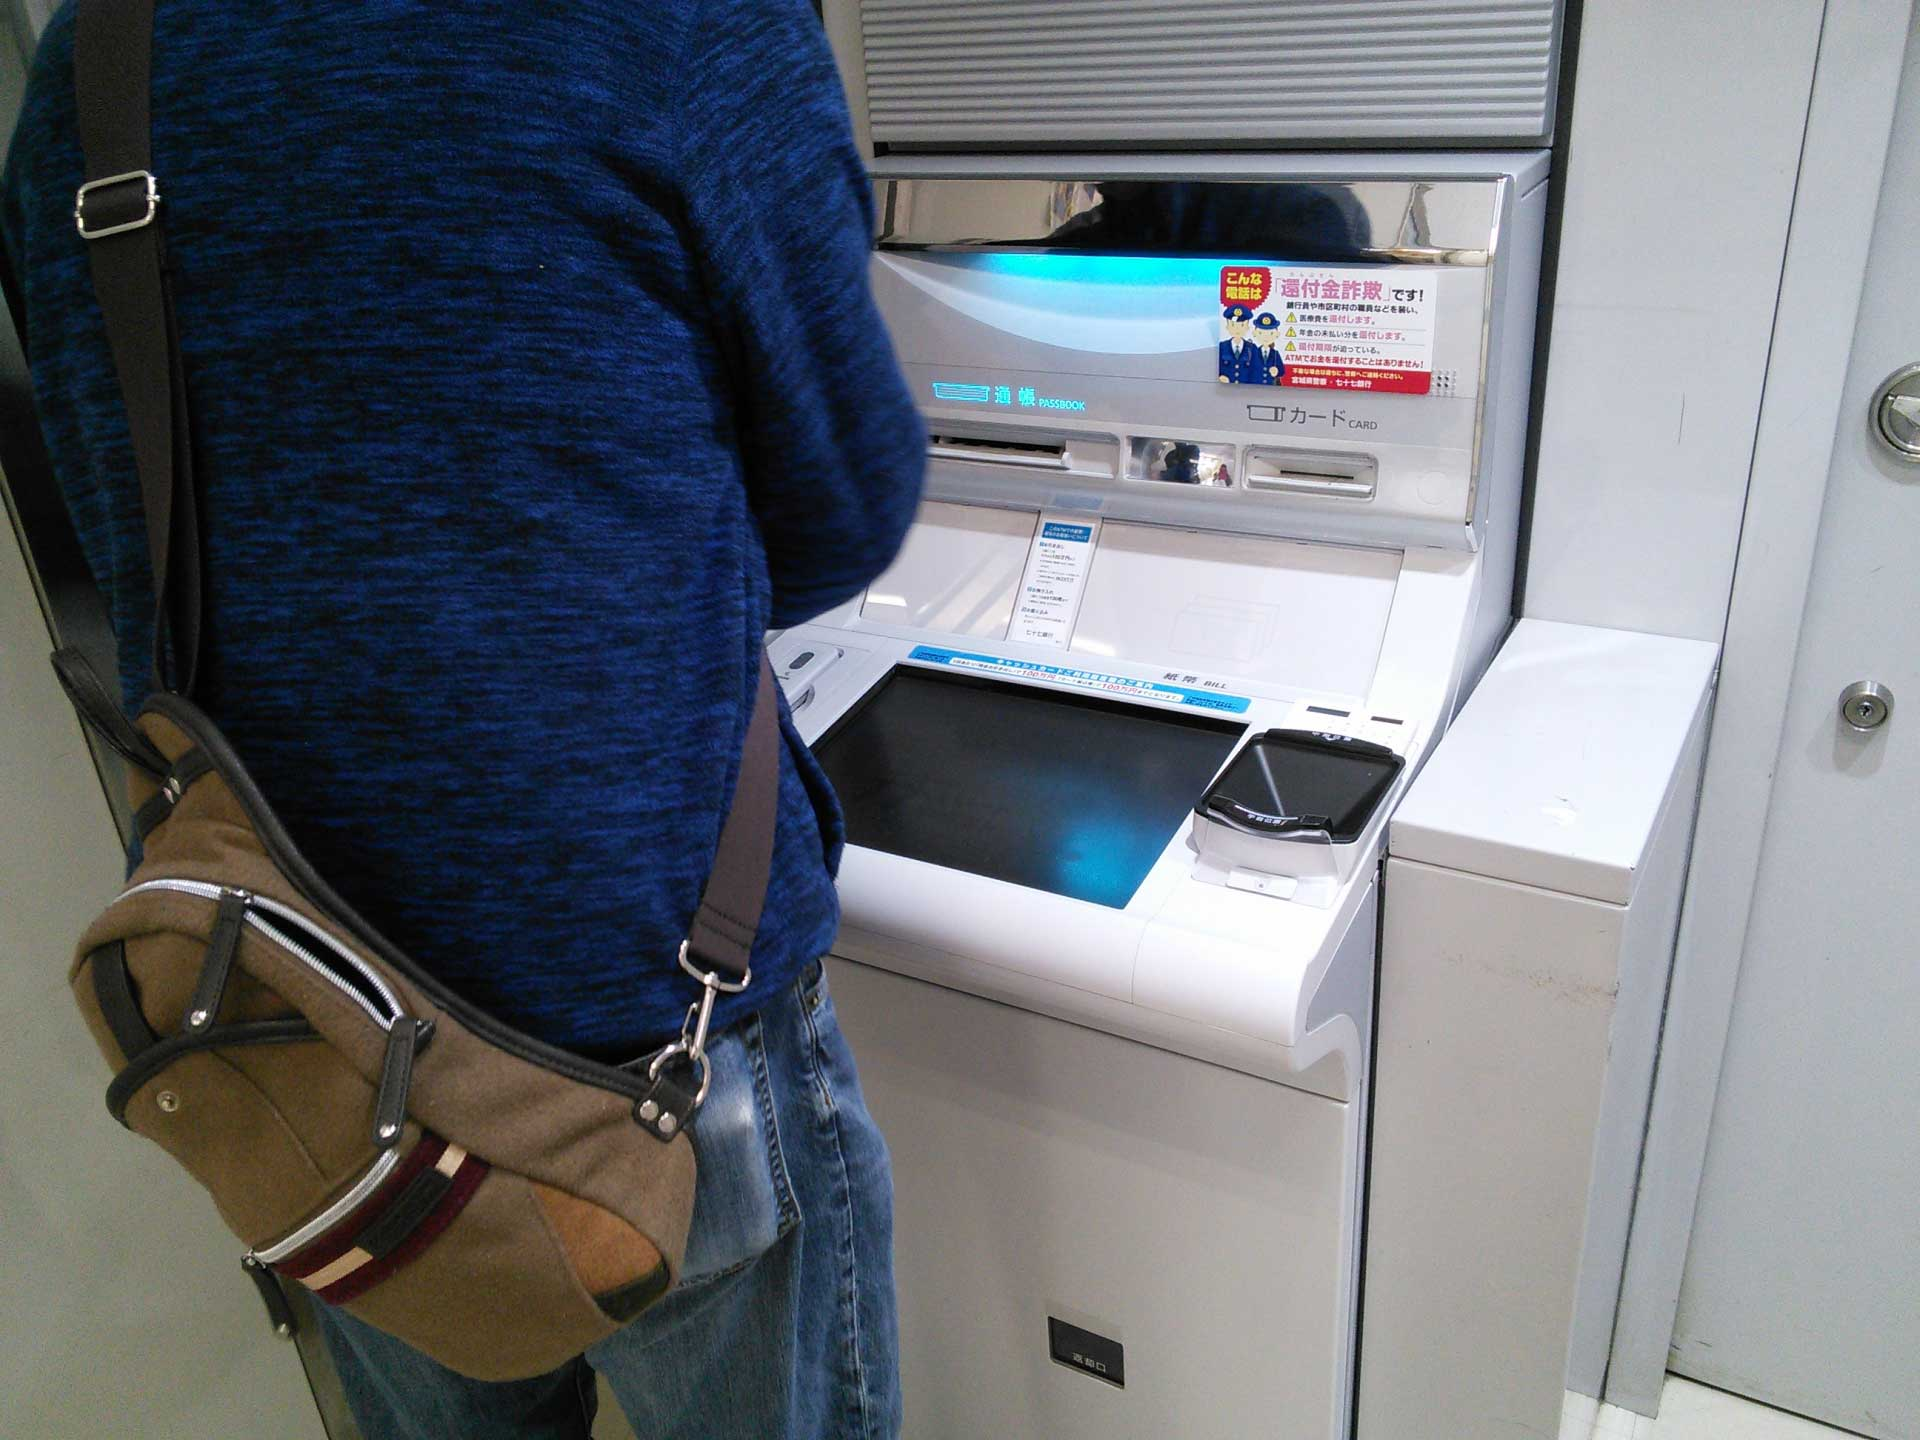 ATMを操作する後ろ姿の画像